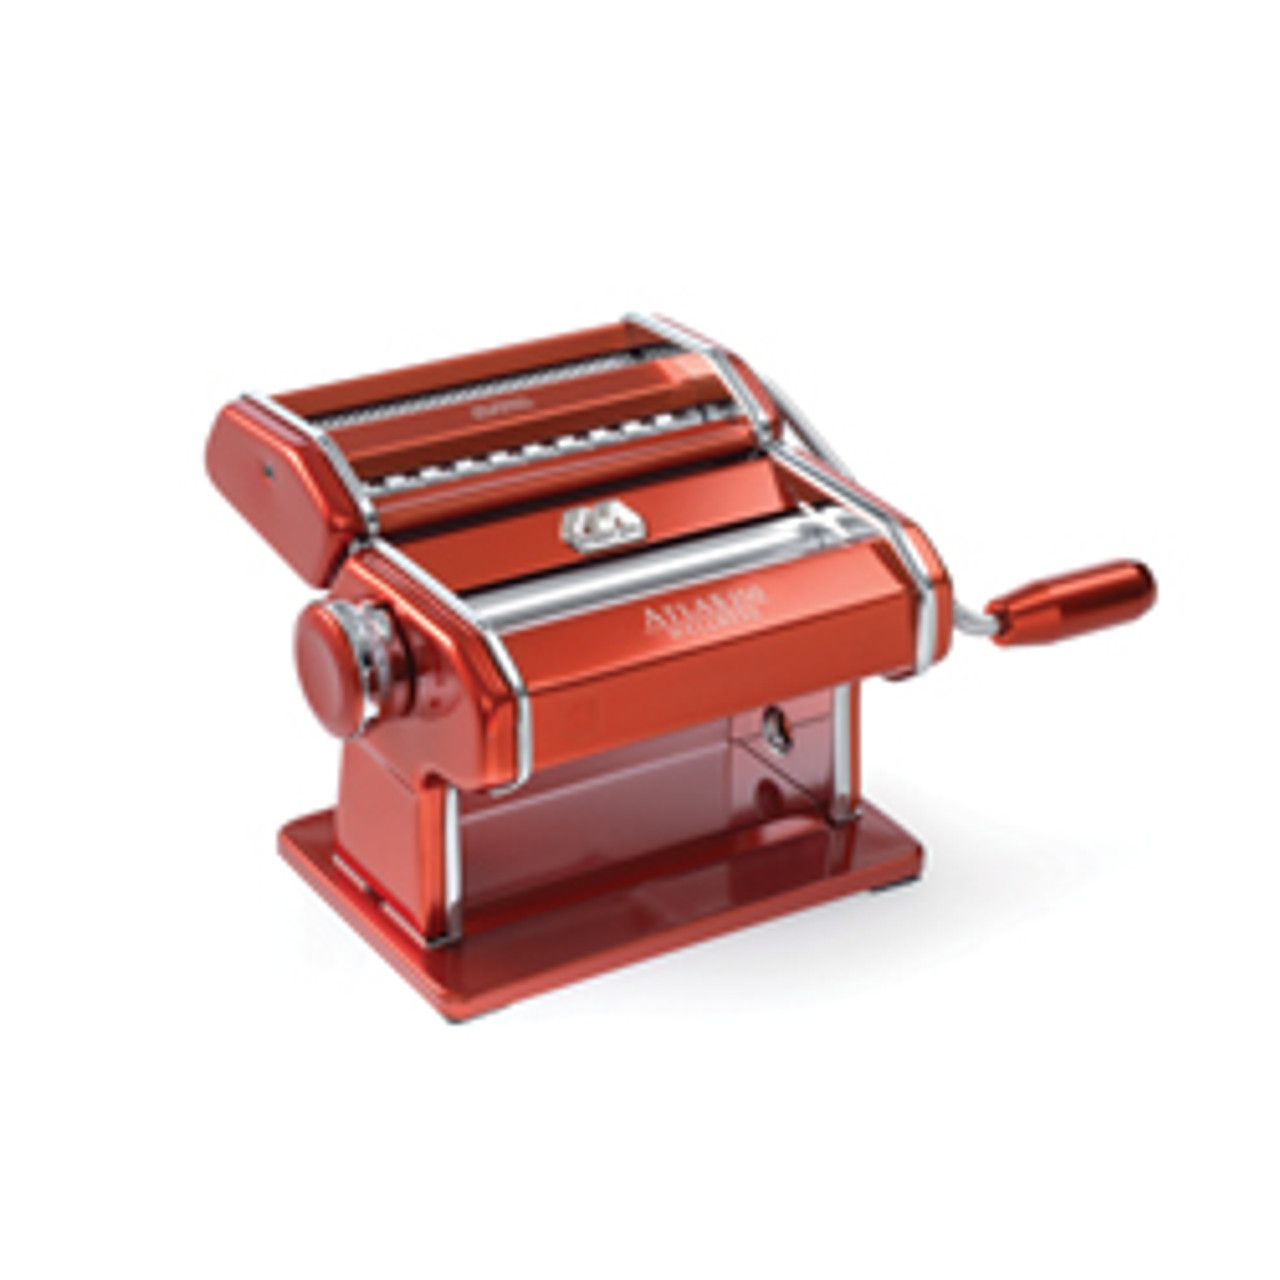 Marcato Atlas Pasta Machine, Red